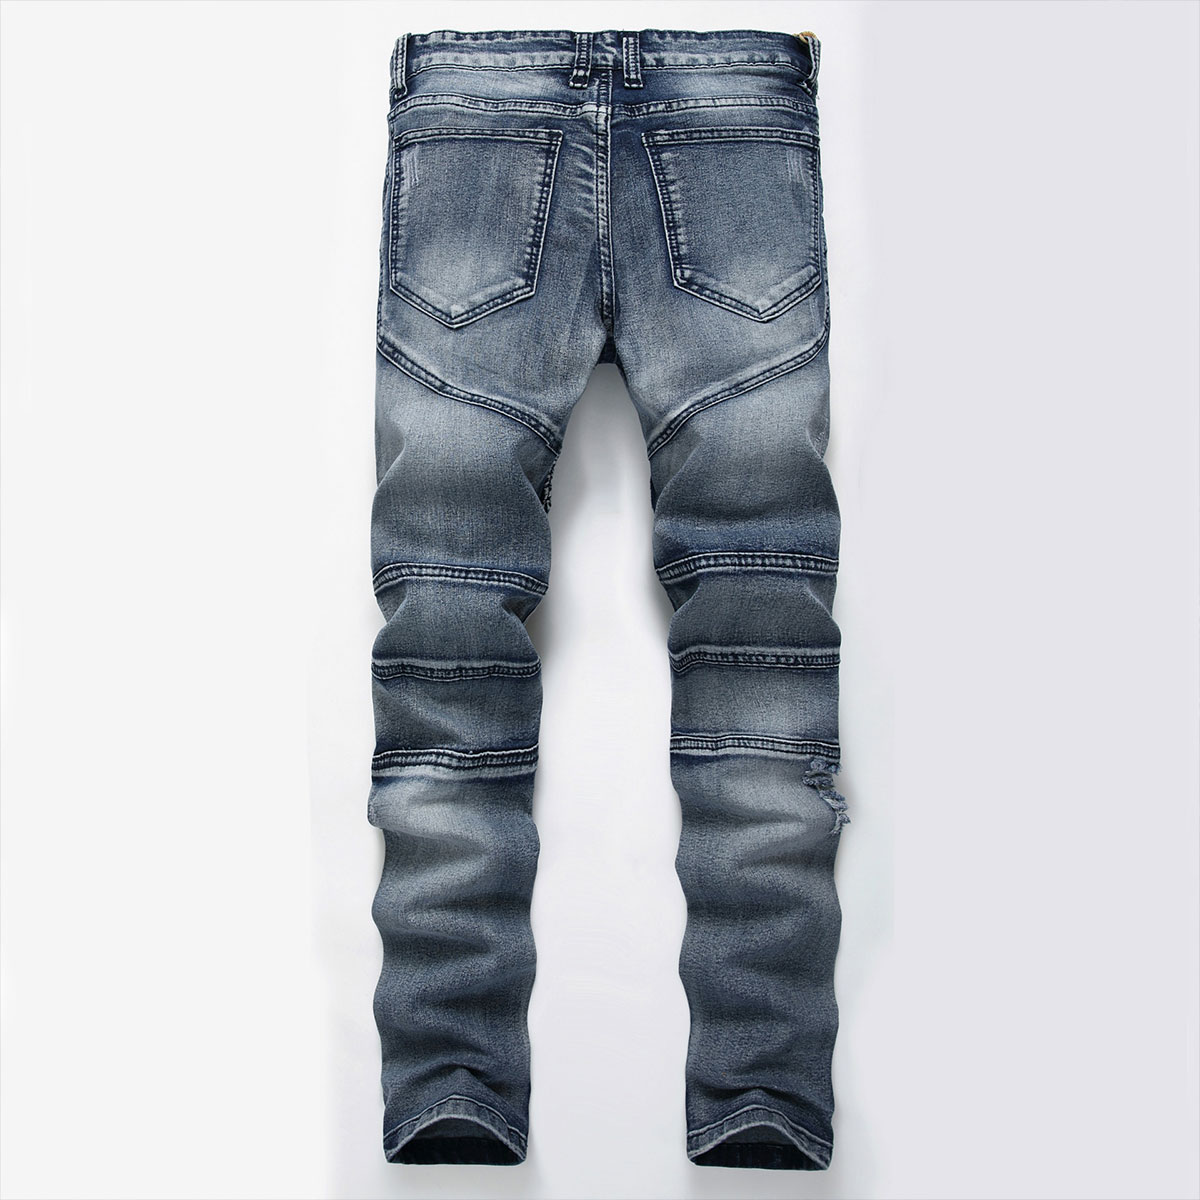 Men-039-s-Skinny-Biker-Jeans-Destroyed-Slim-Fit-Denim-Ripped-Pencil-Pants-Trousers thumbnail 20